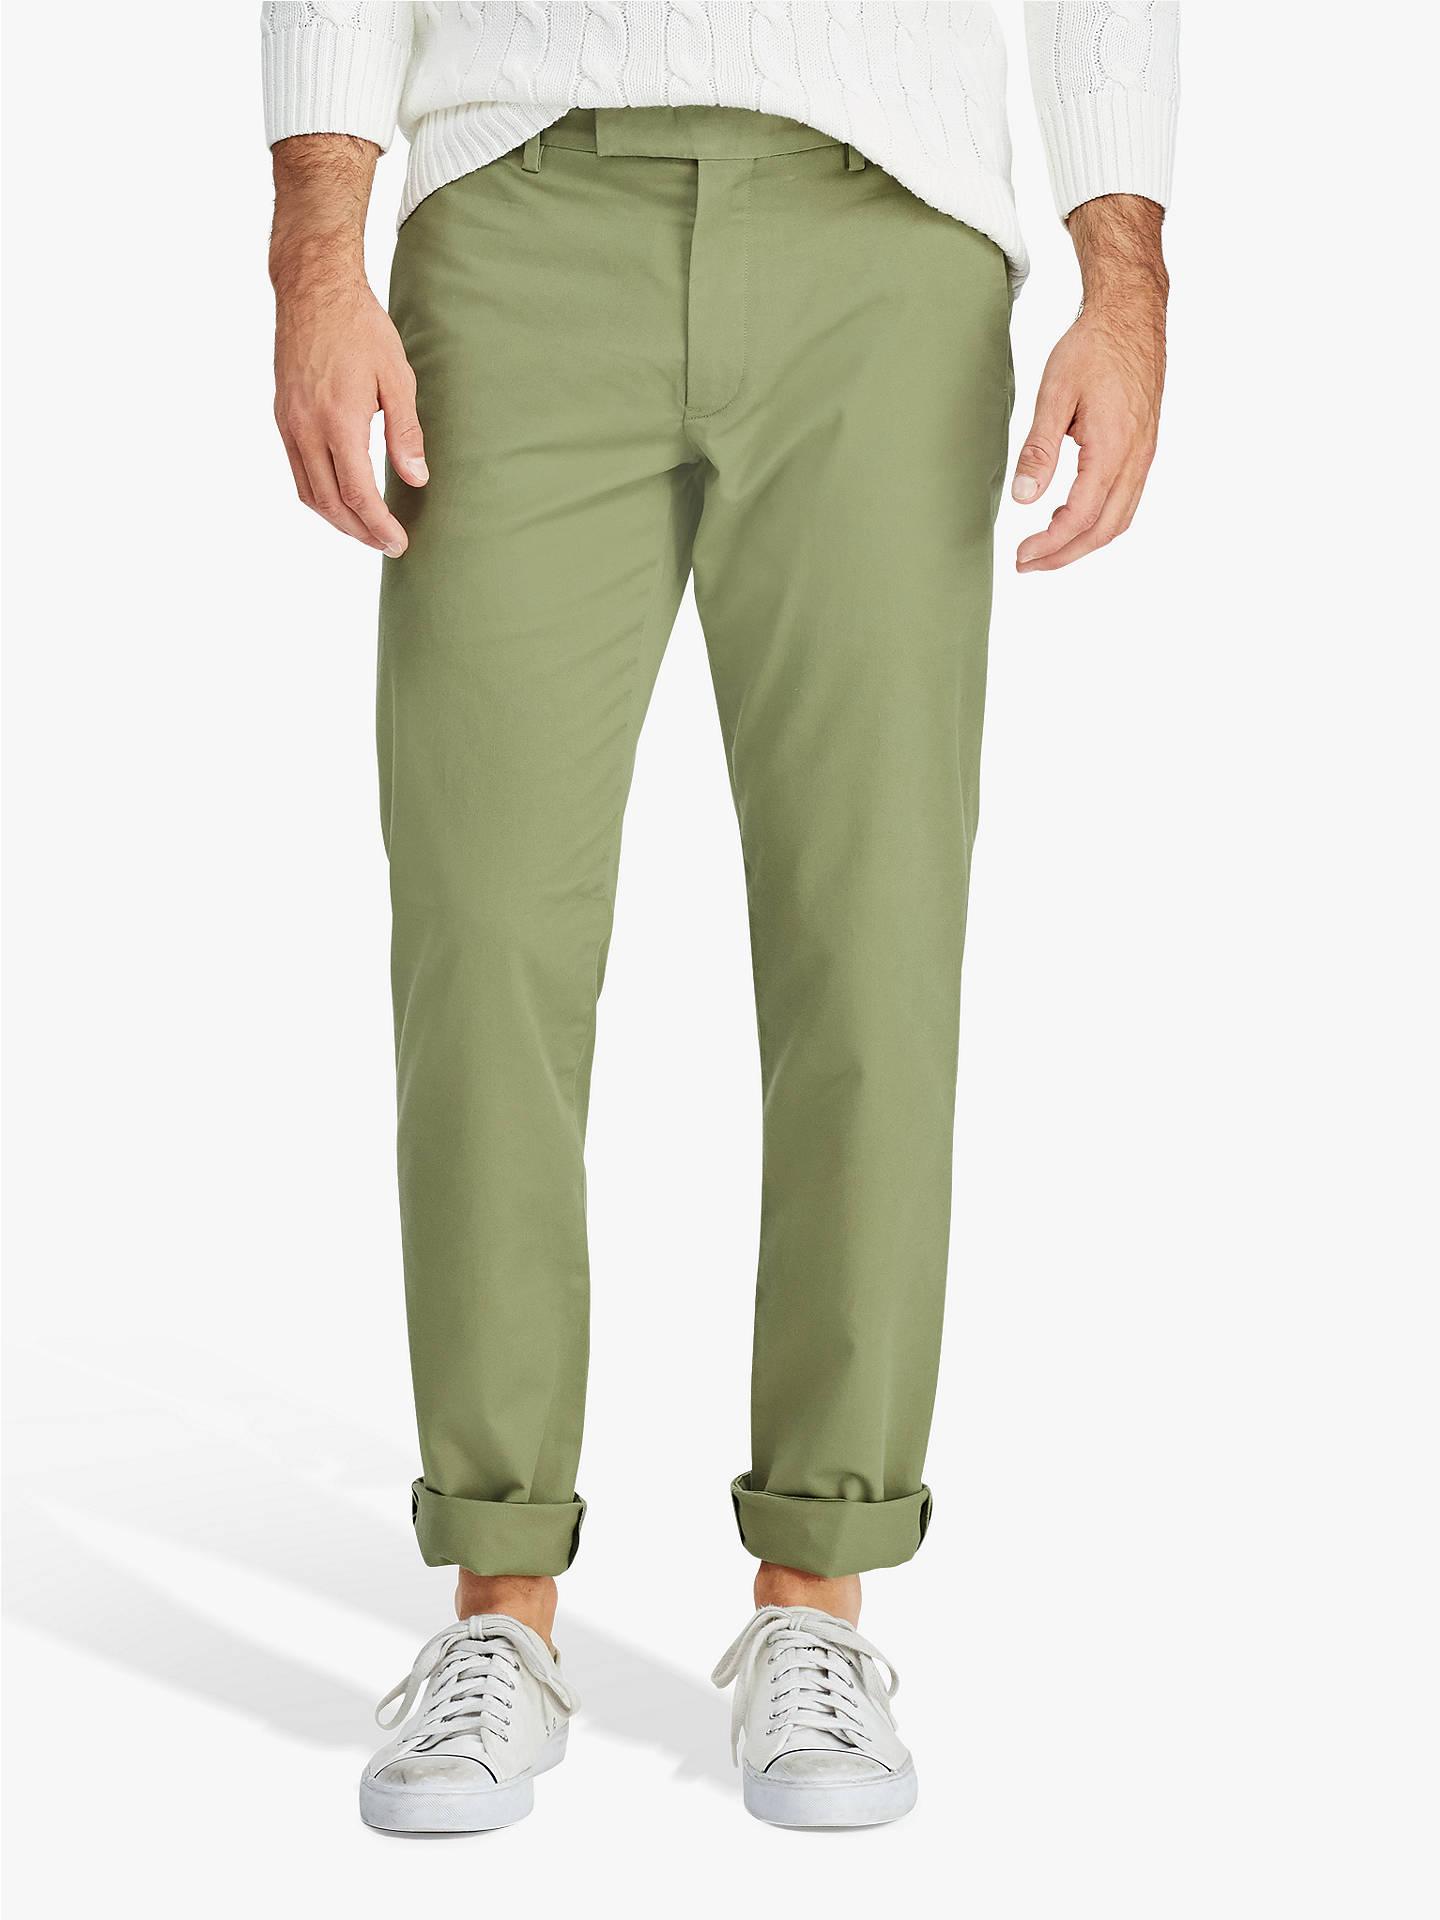 eee06ad9 Polo Ralph Lauren Flat Pant Slim Chino, Spanish Green at John Lewis ...